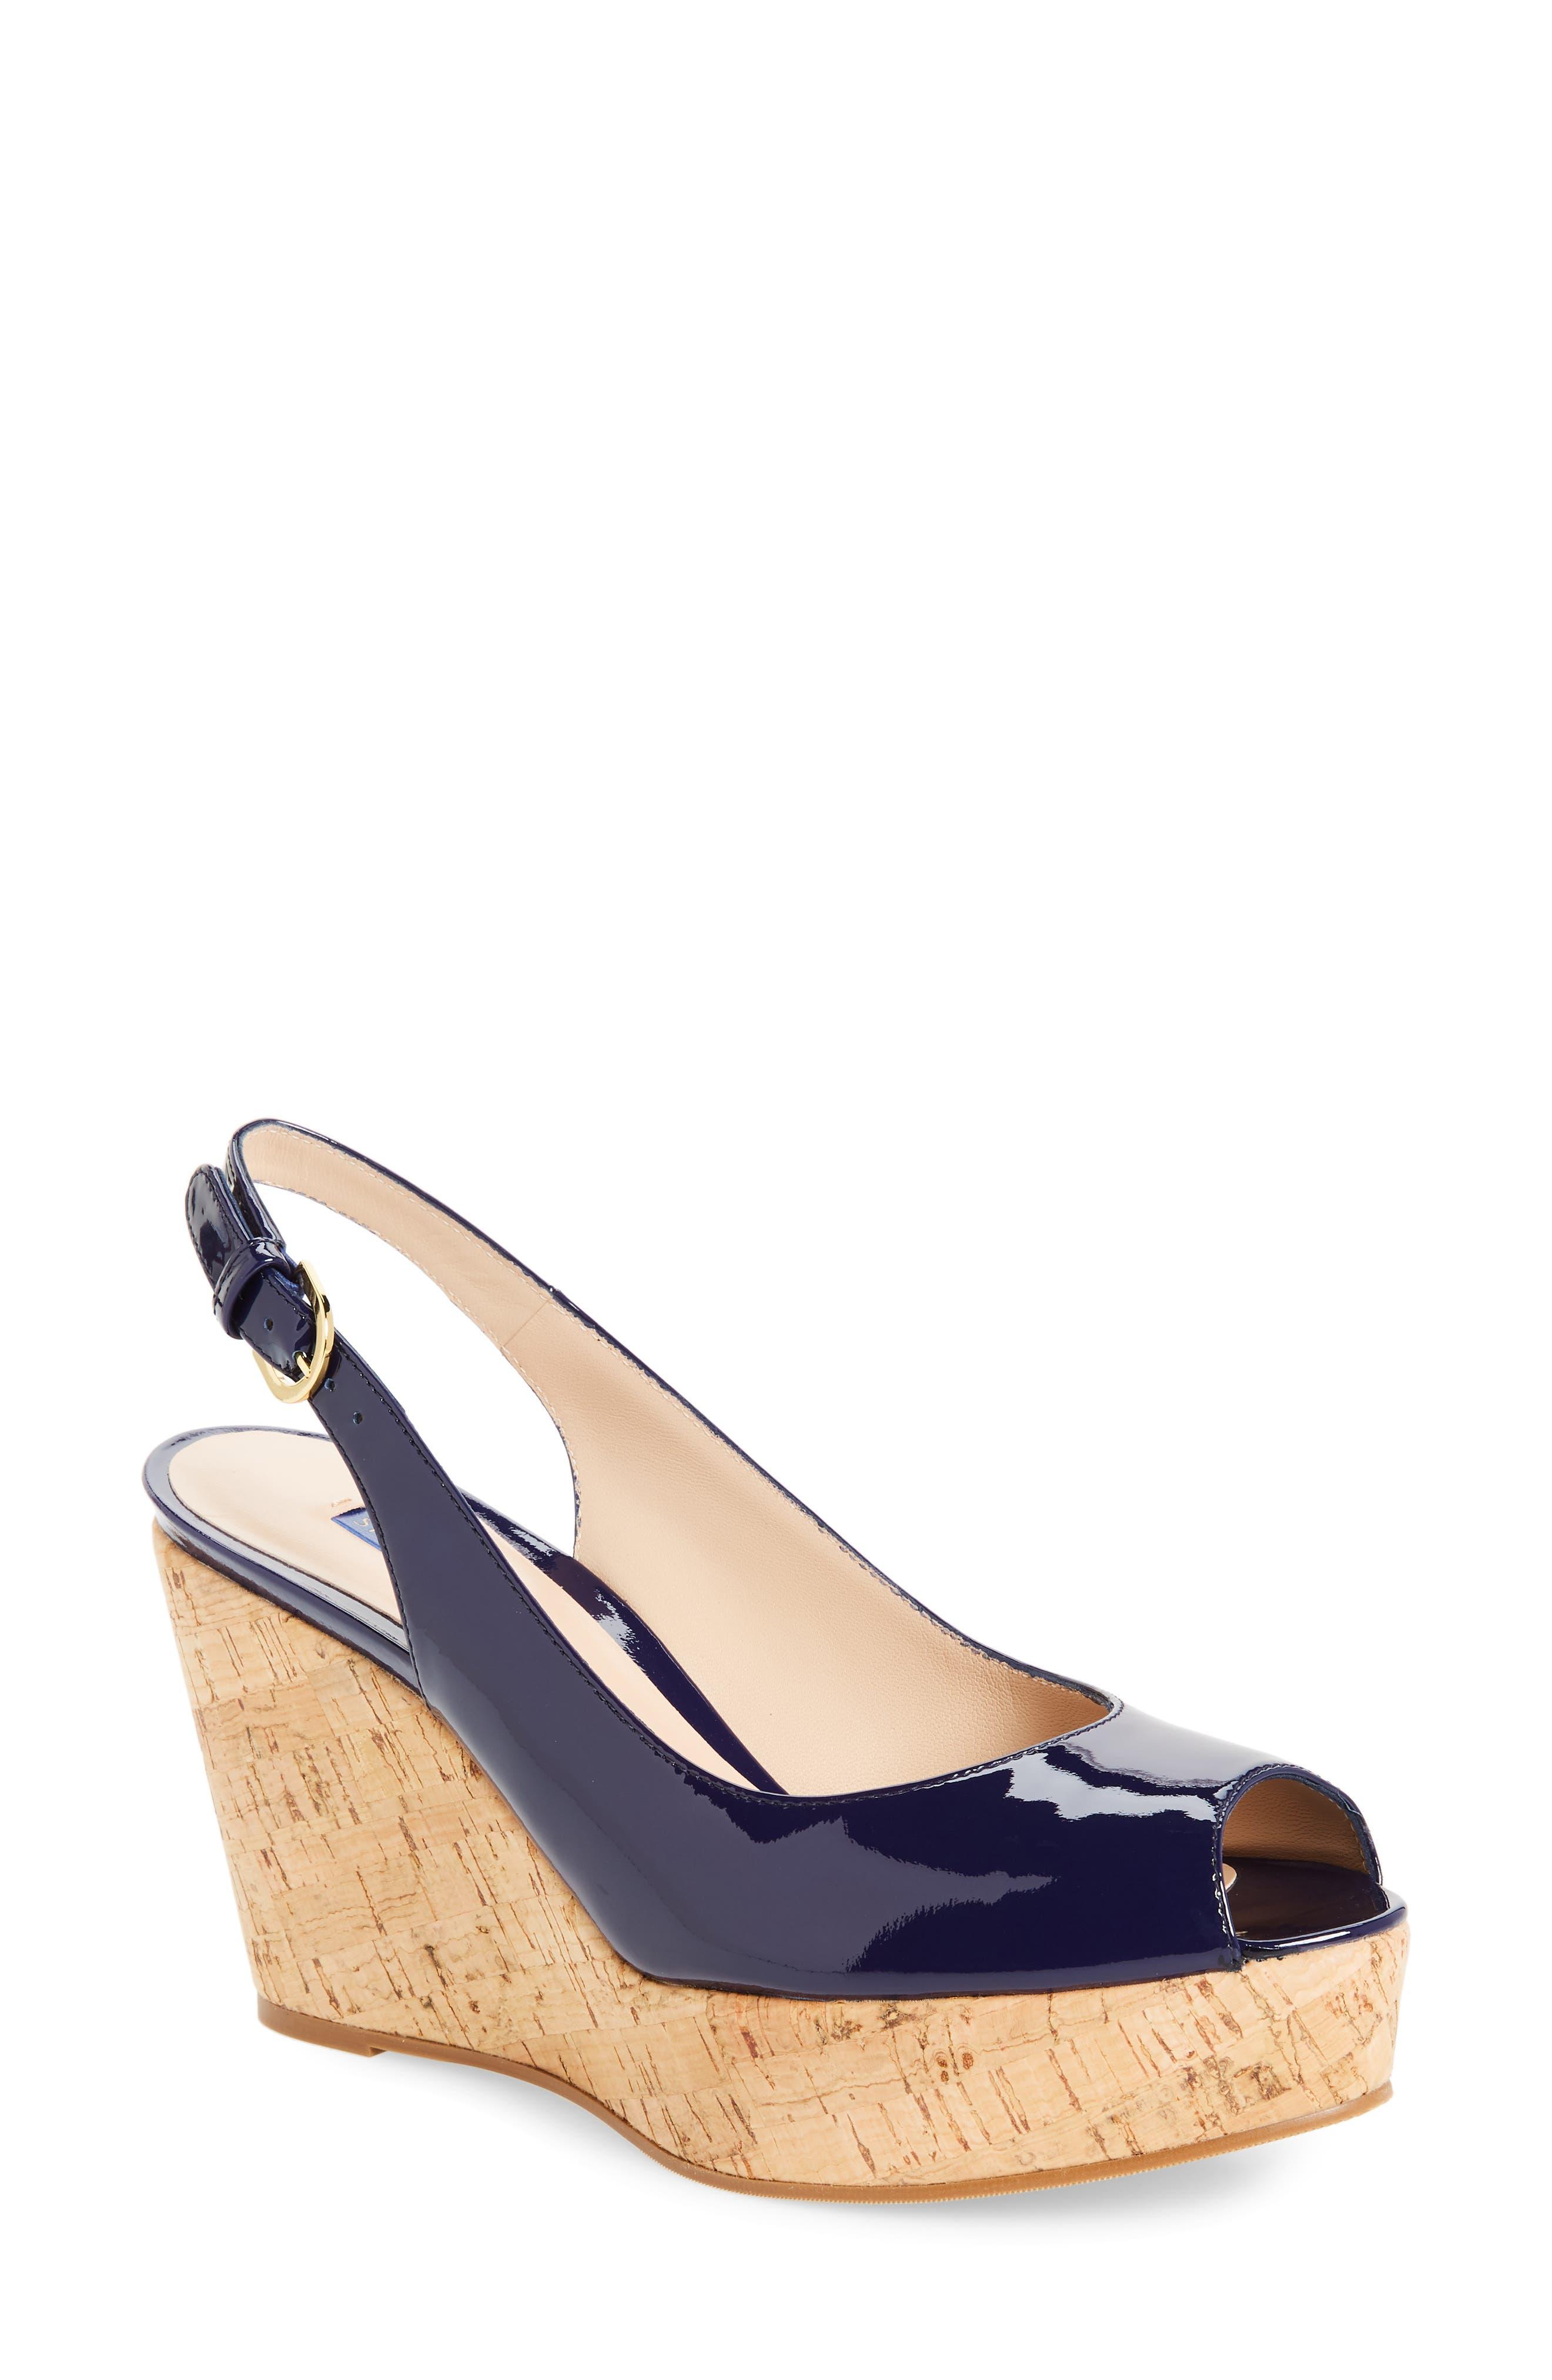 5428551d7c43 Stuart Weitzman Sandals   Wedges for Women